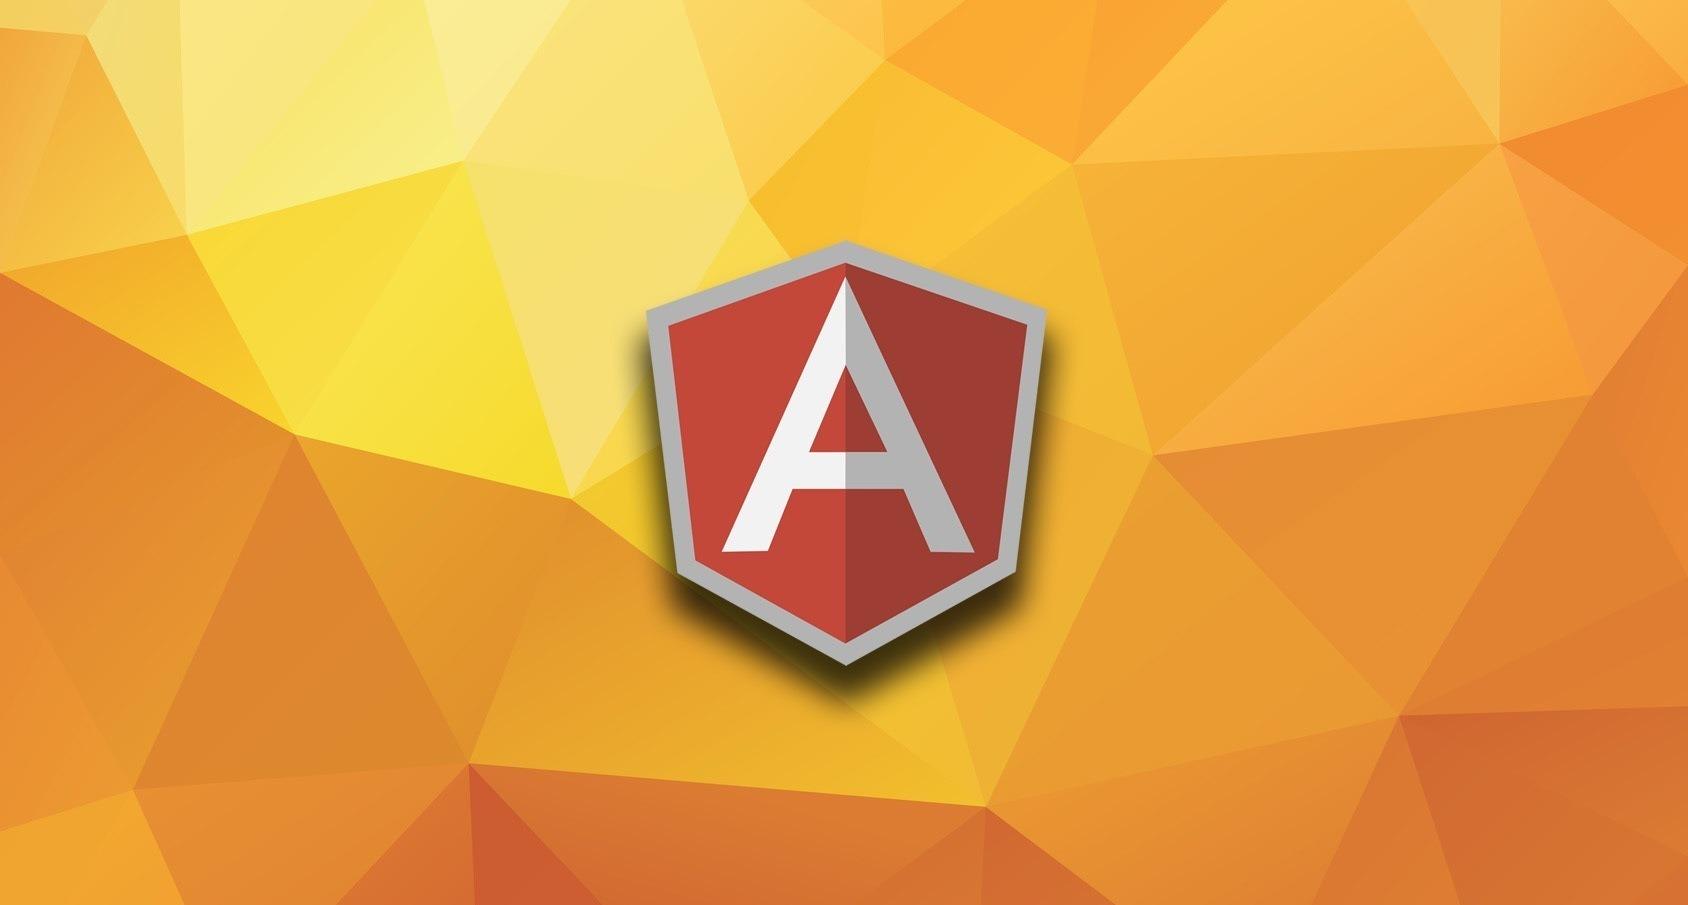 angularjs_rubyonrails_application_banner